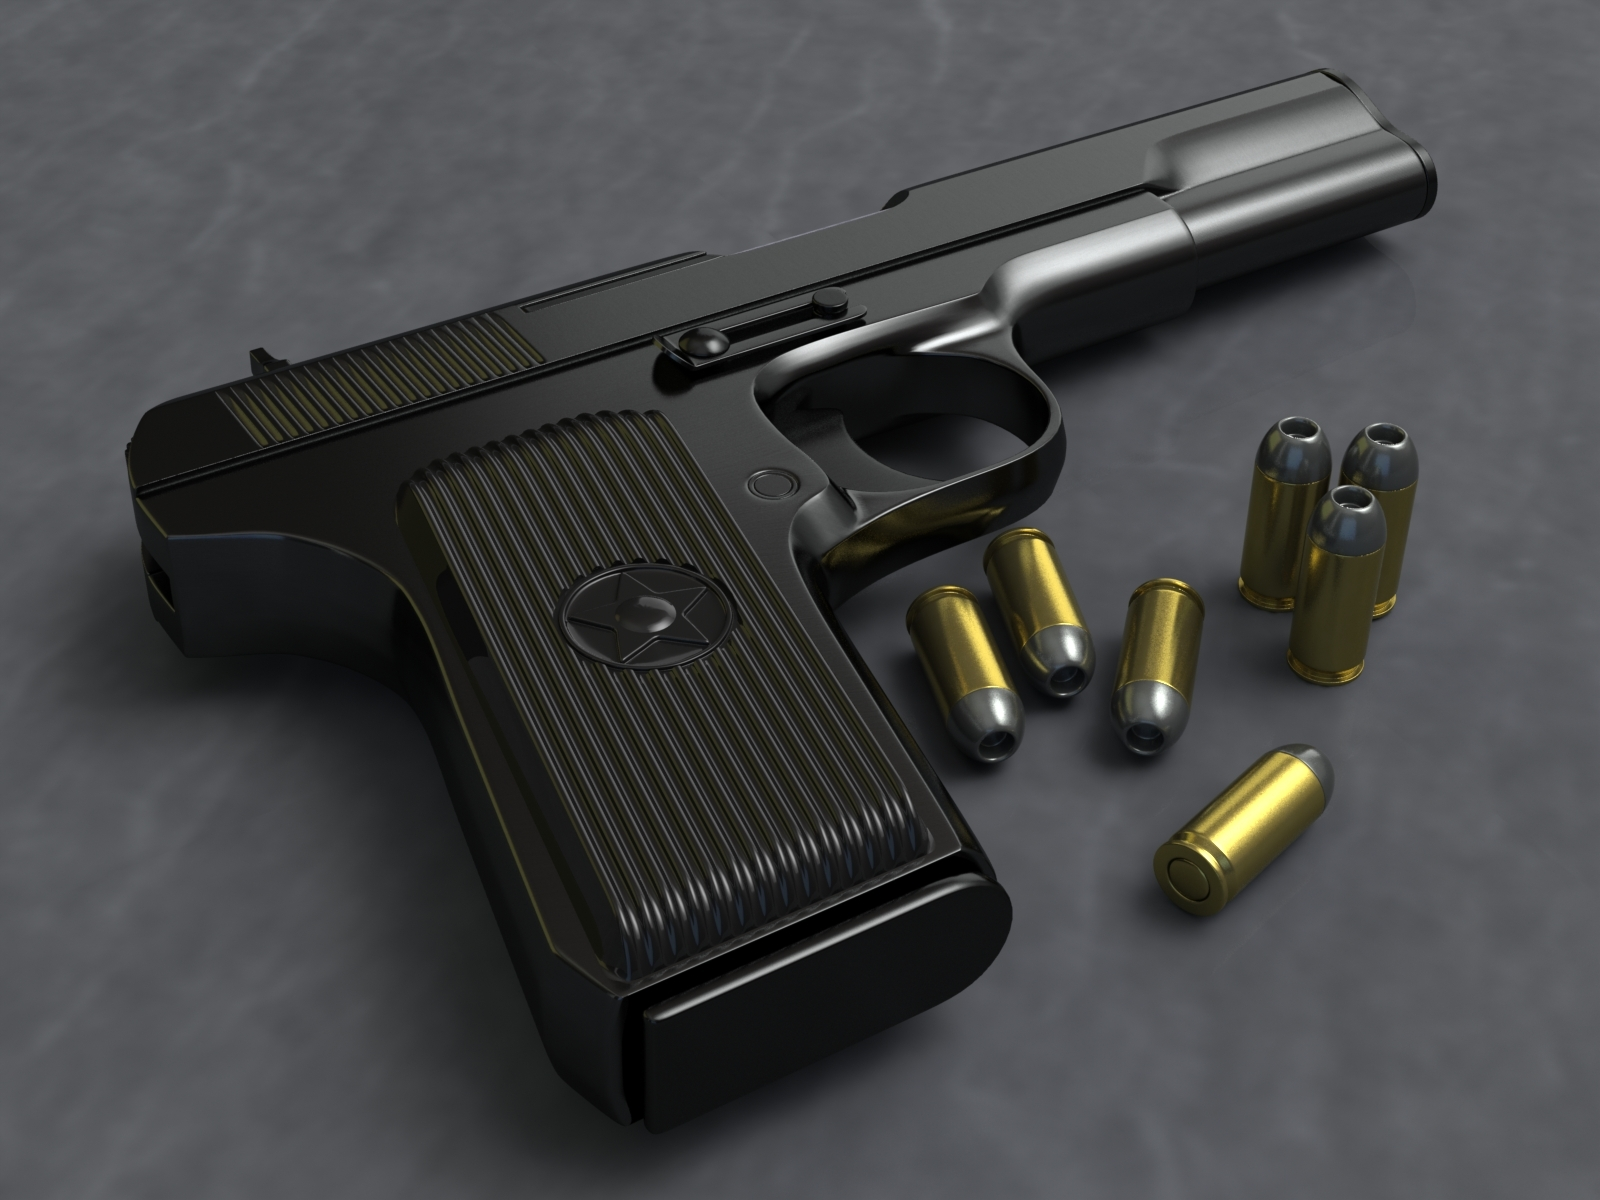 Norinco 9mm Pistol